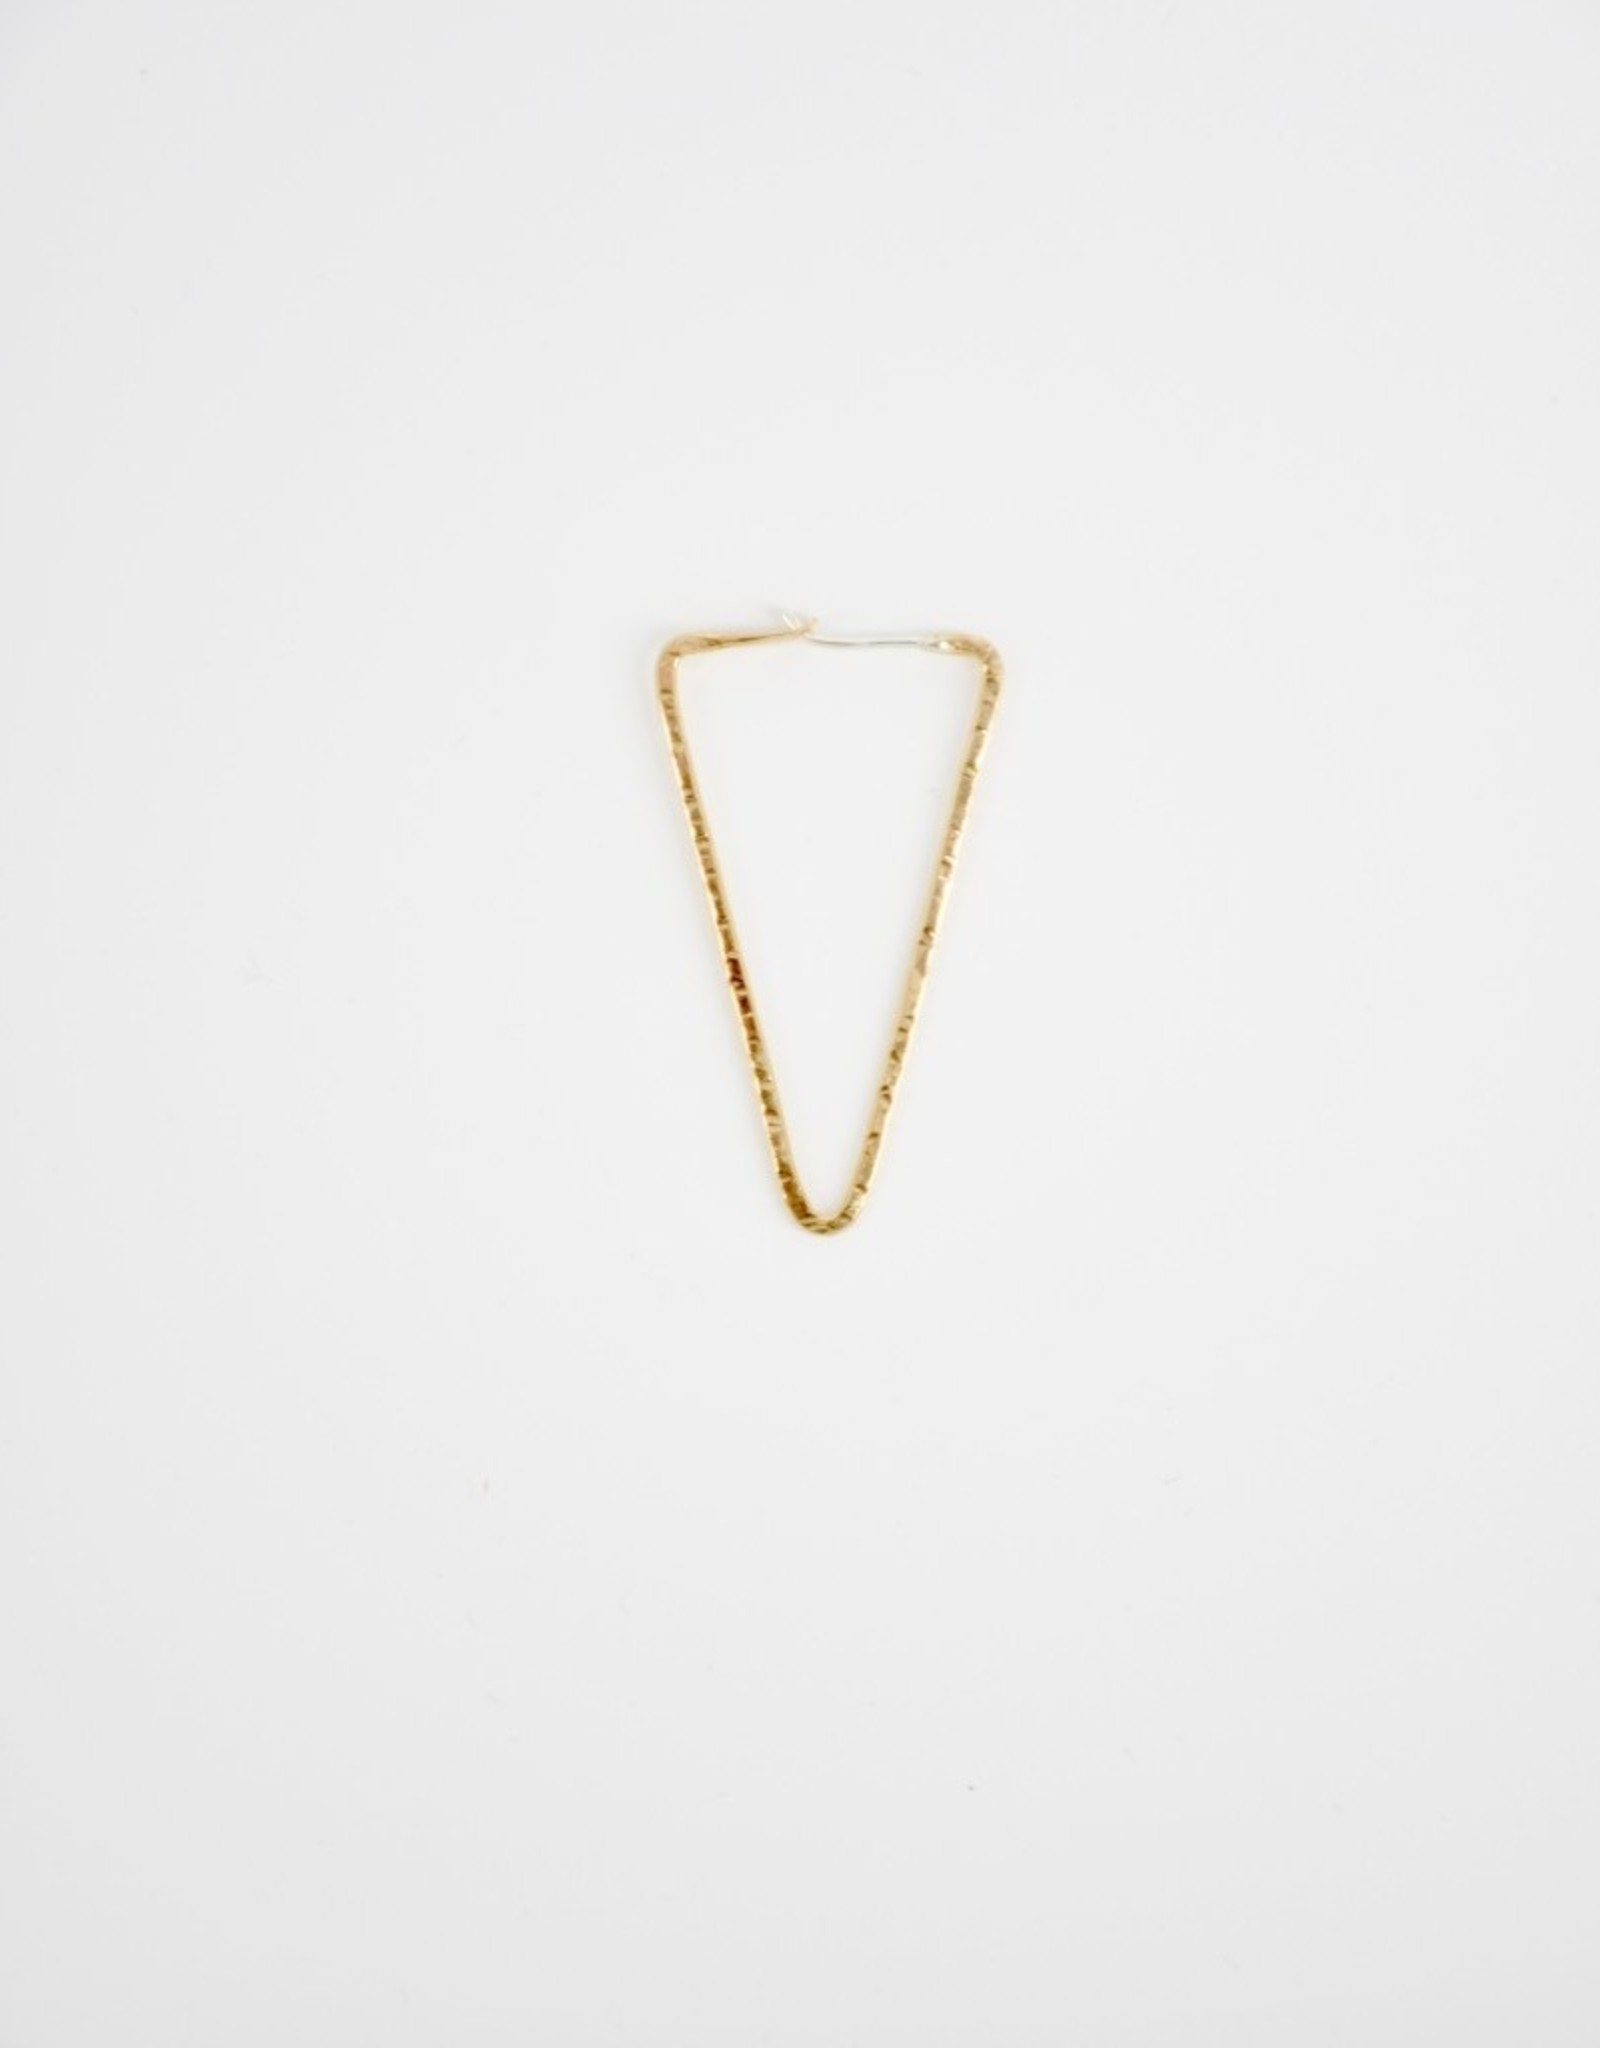 STONELEAF Hammered Gold Triangle Hoops